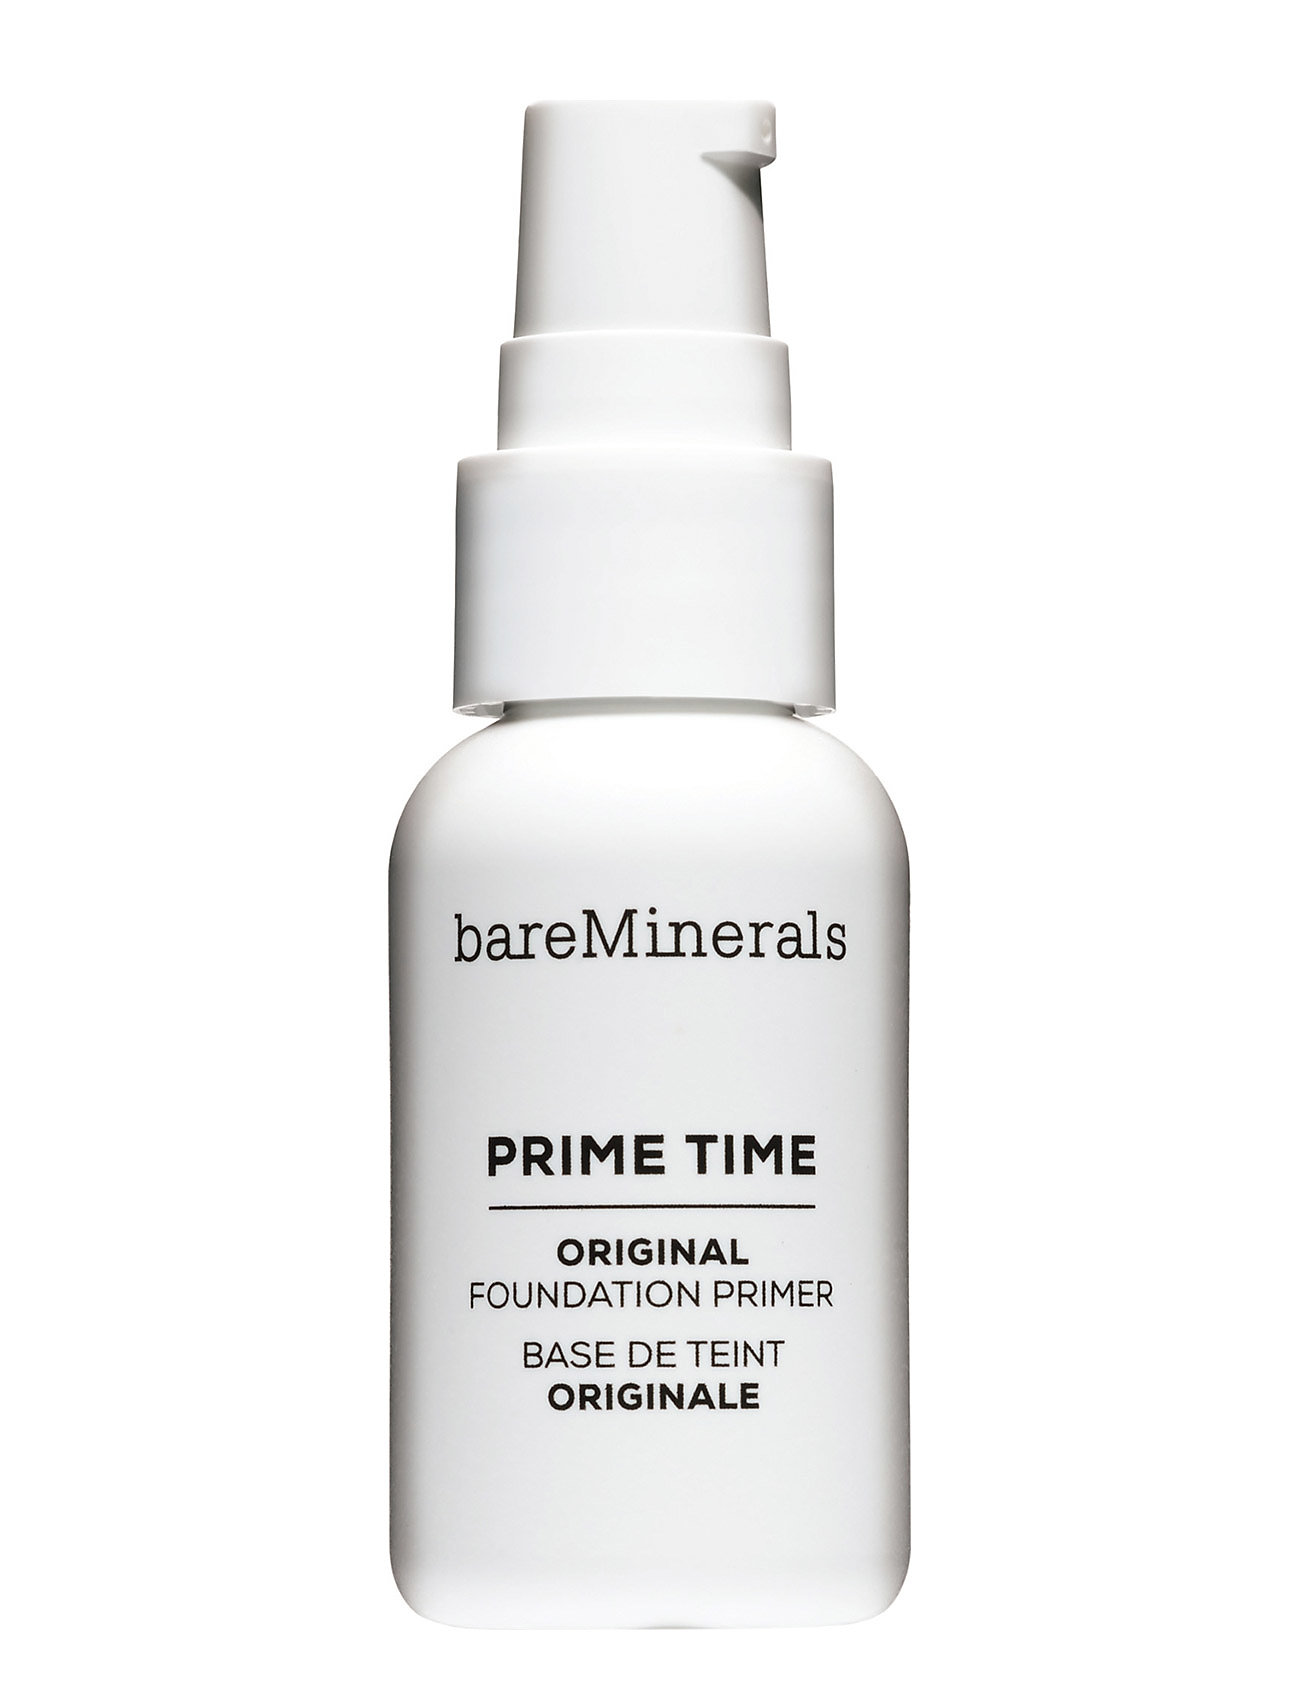 bareMinerals Prime Time Original Foundation Primer - NO COLOR